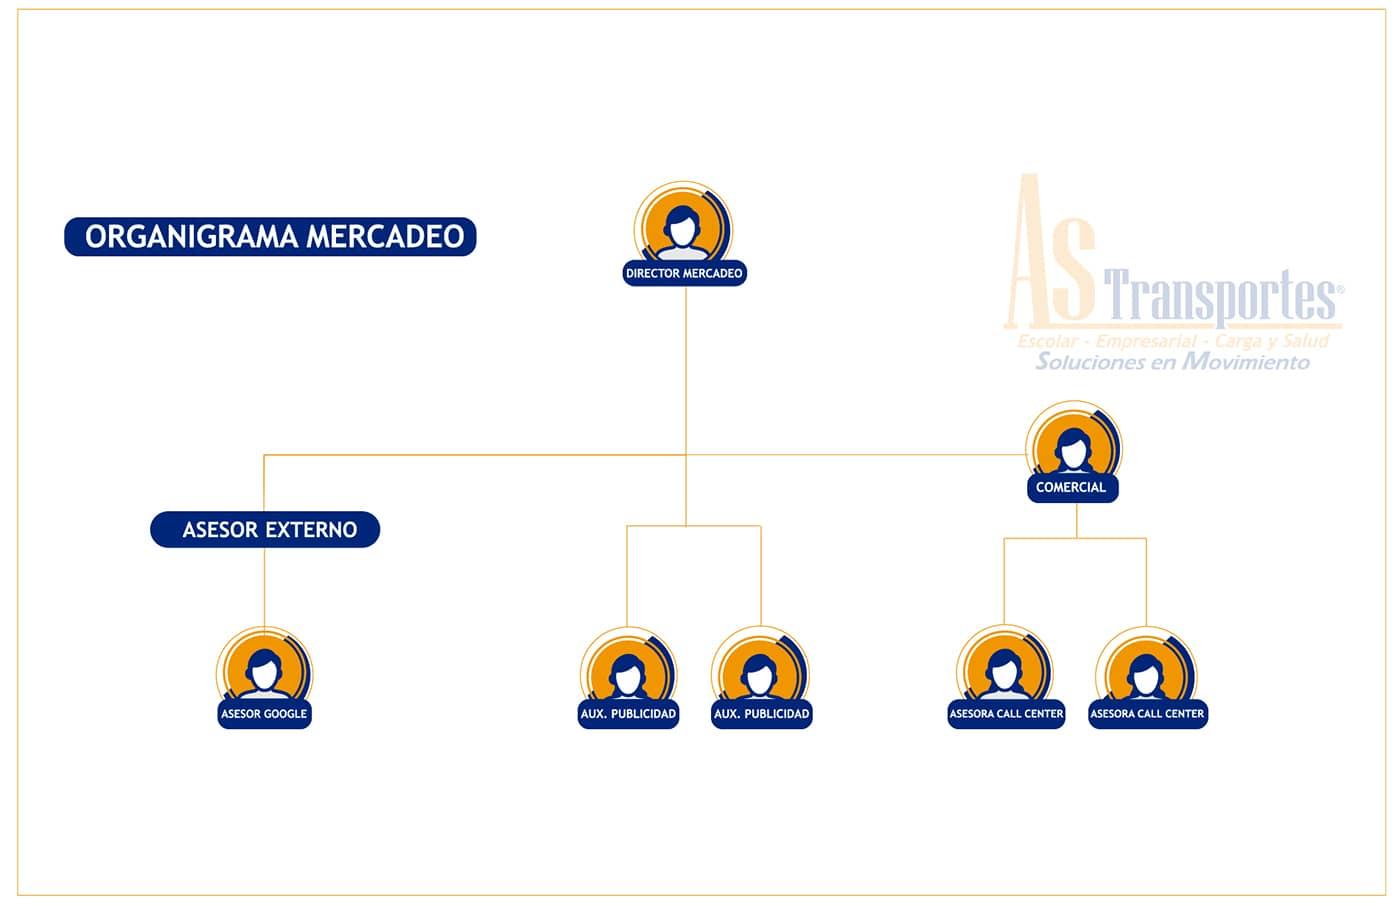 ORGANIGRAMA DE PAGINA WEB MERCADEO